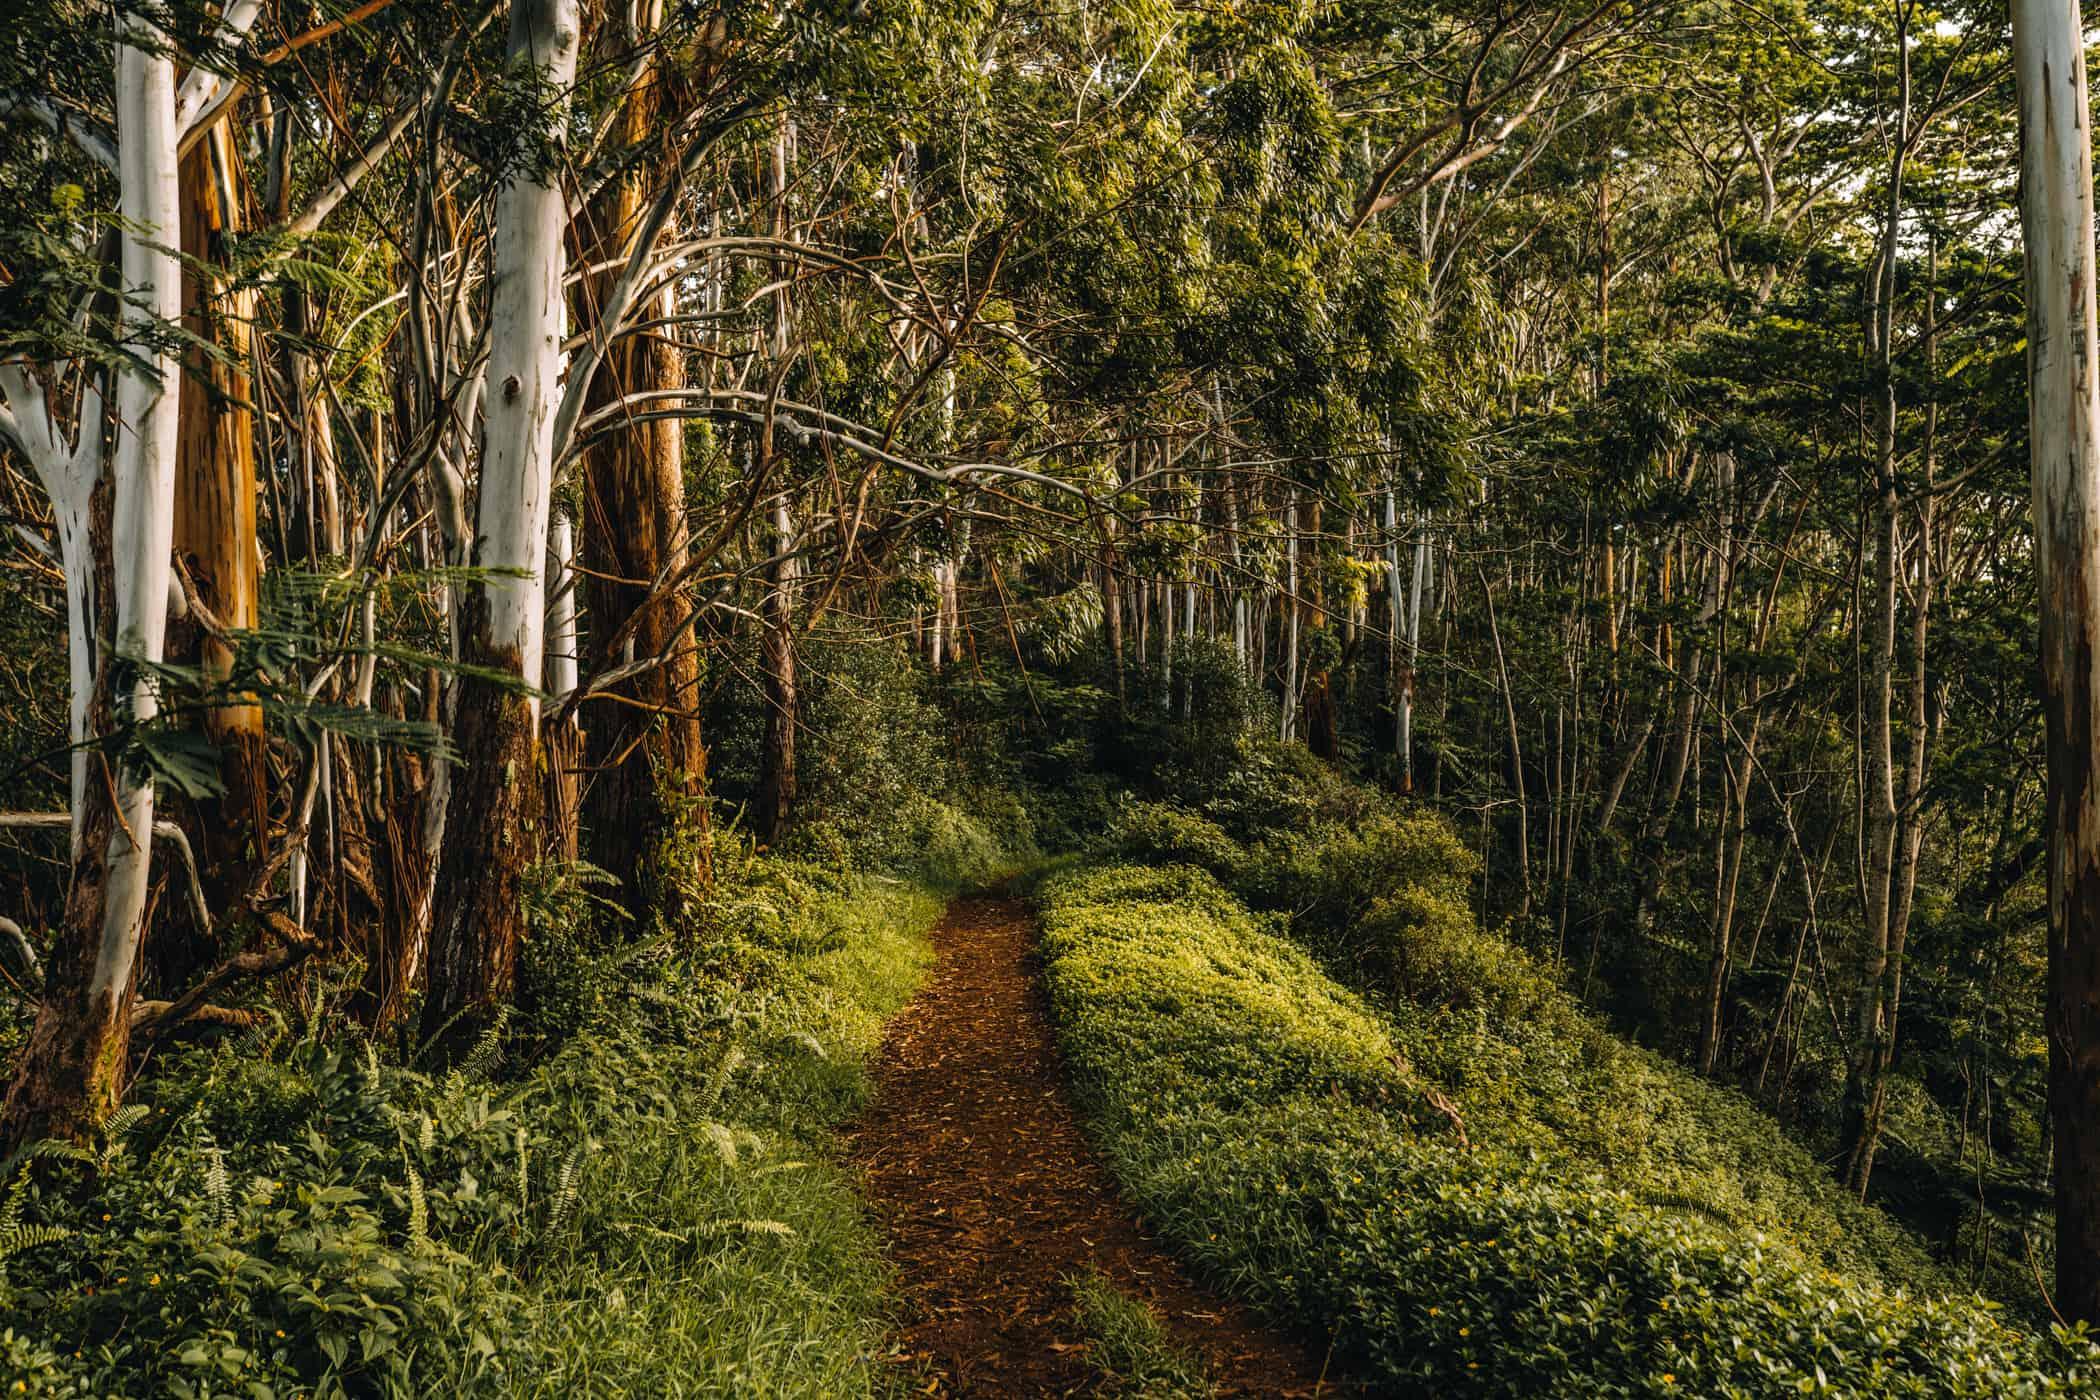 Kauai - Strände, Wandern & Ausflugsziele: Auf dem Kuilao Ridge Trail